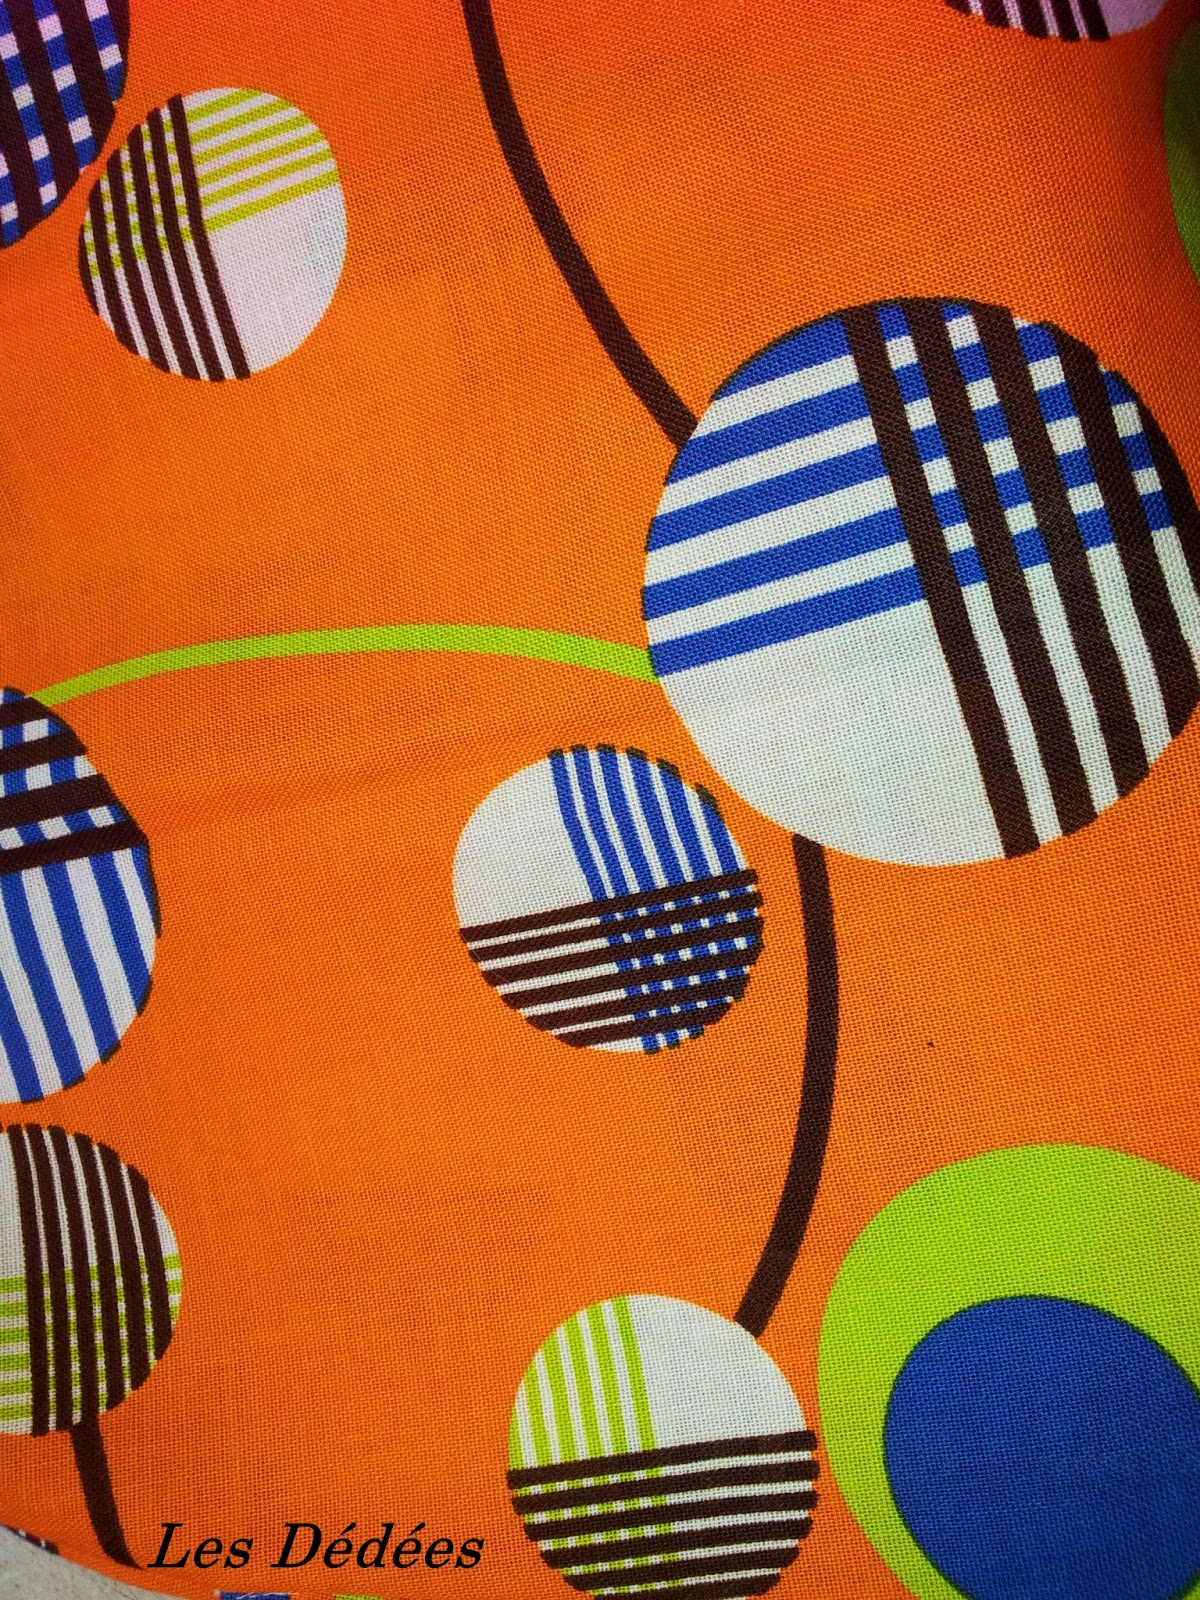 les dedees vintage recup creations robe annees 70 super coloree presque fluo. Black Bedroom Furniture Sets. Home Design Ideas